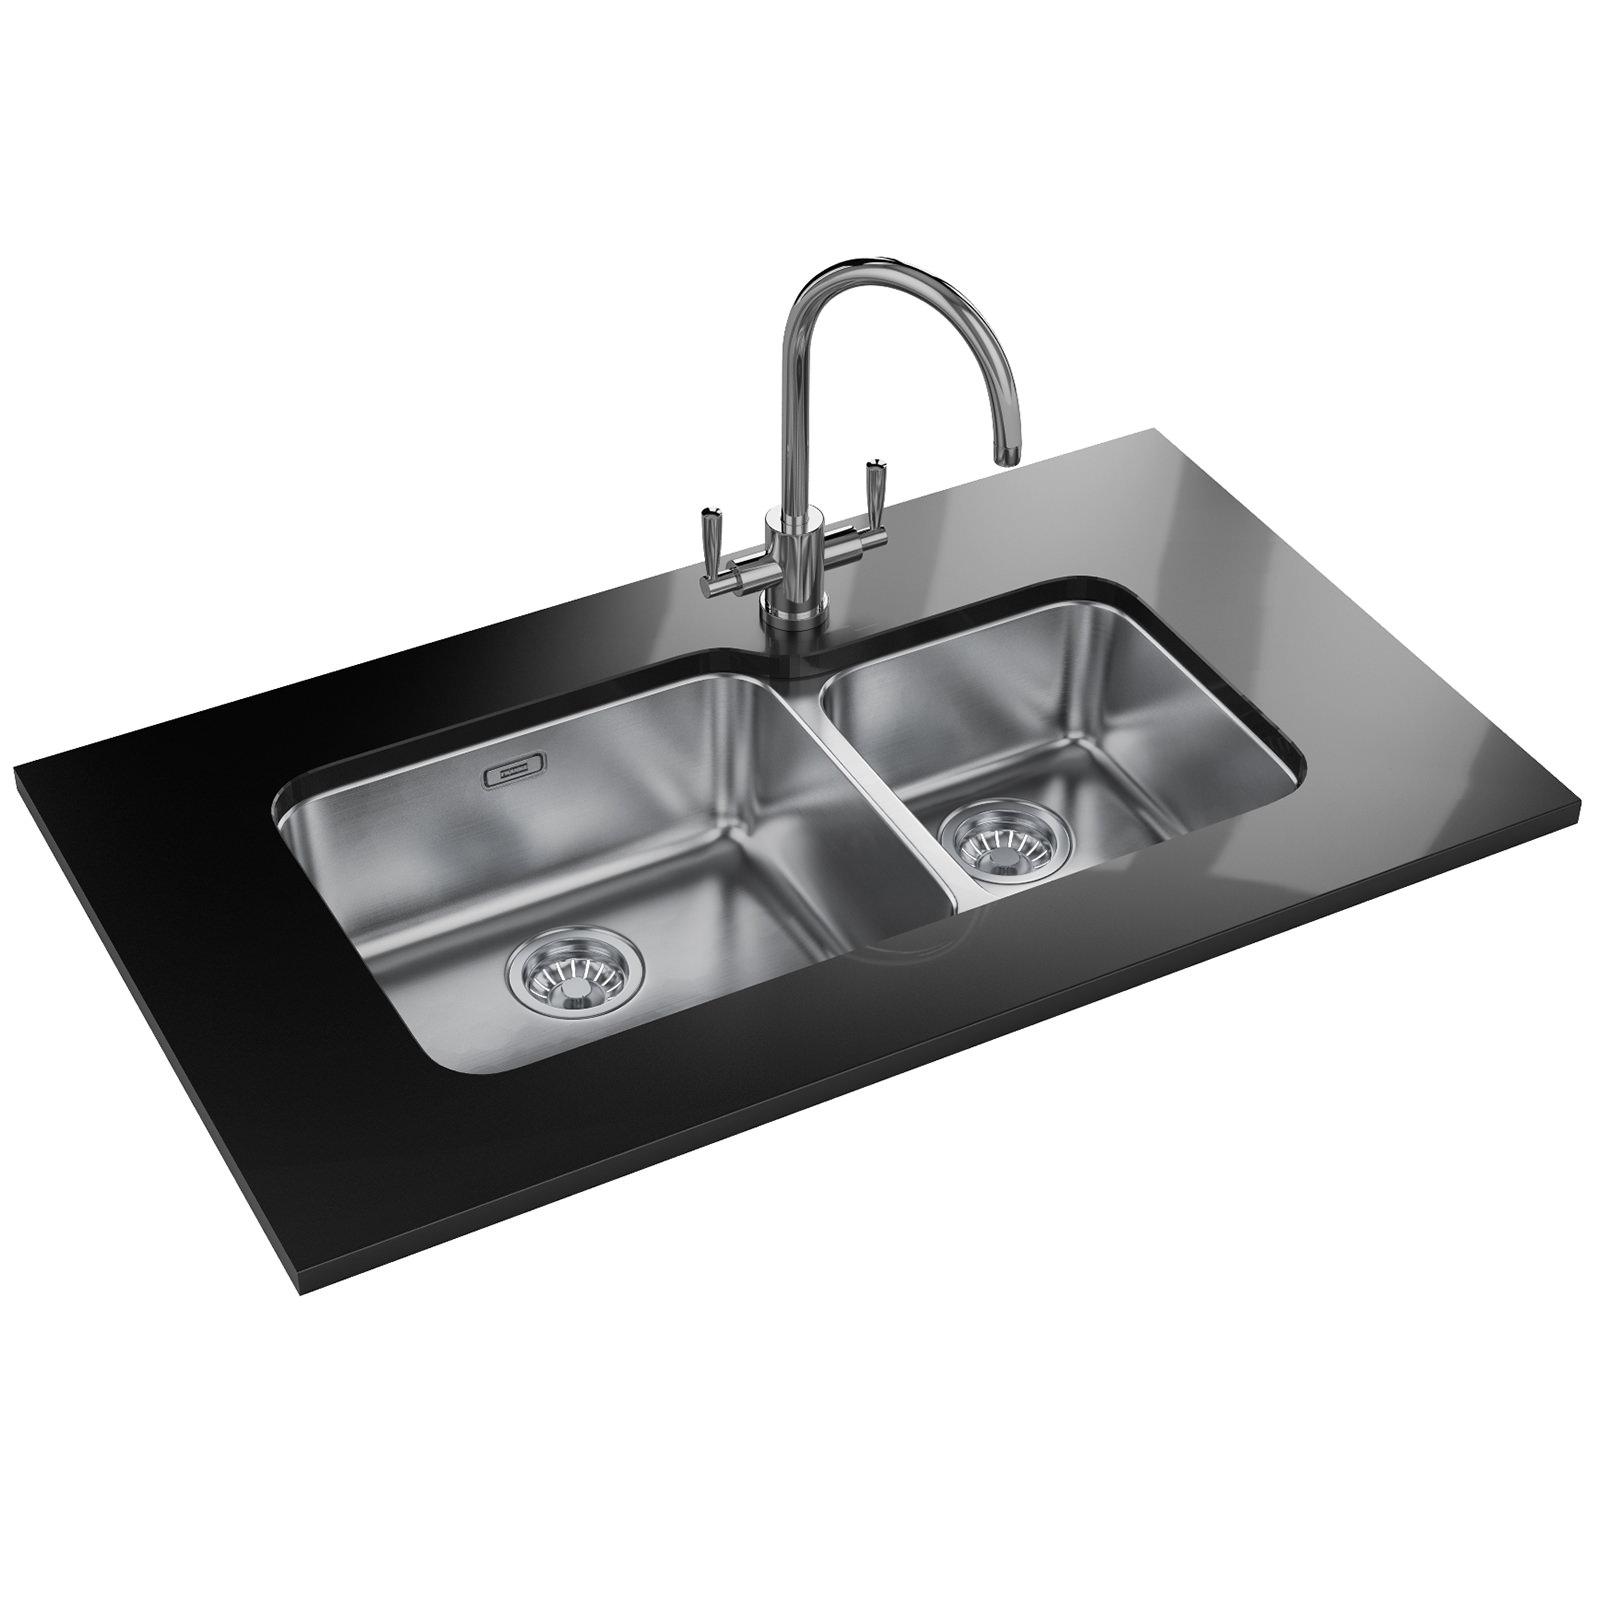 Franke Largo Lax 120 45 30 Stainless Steel 1 5 Bowl